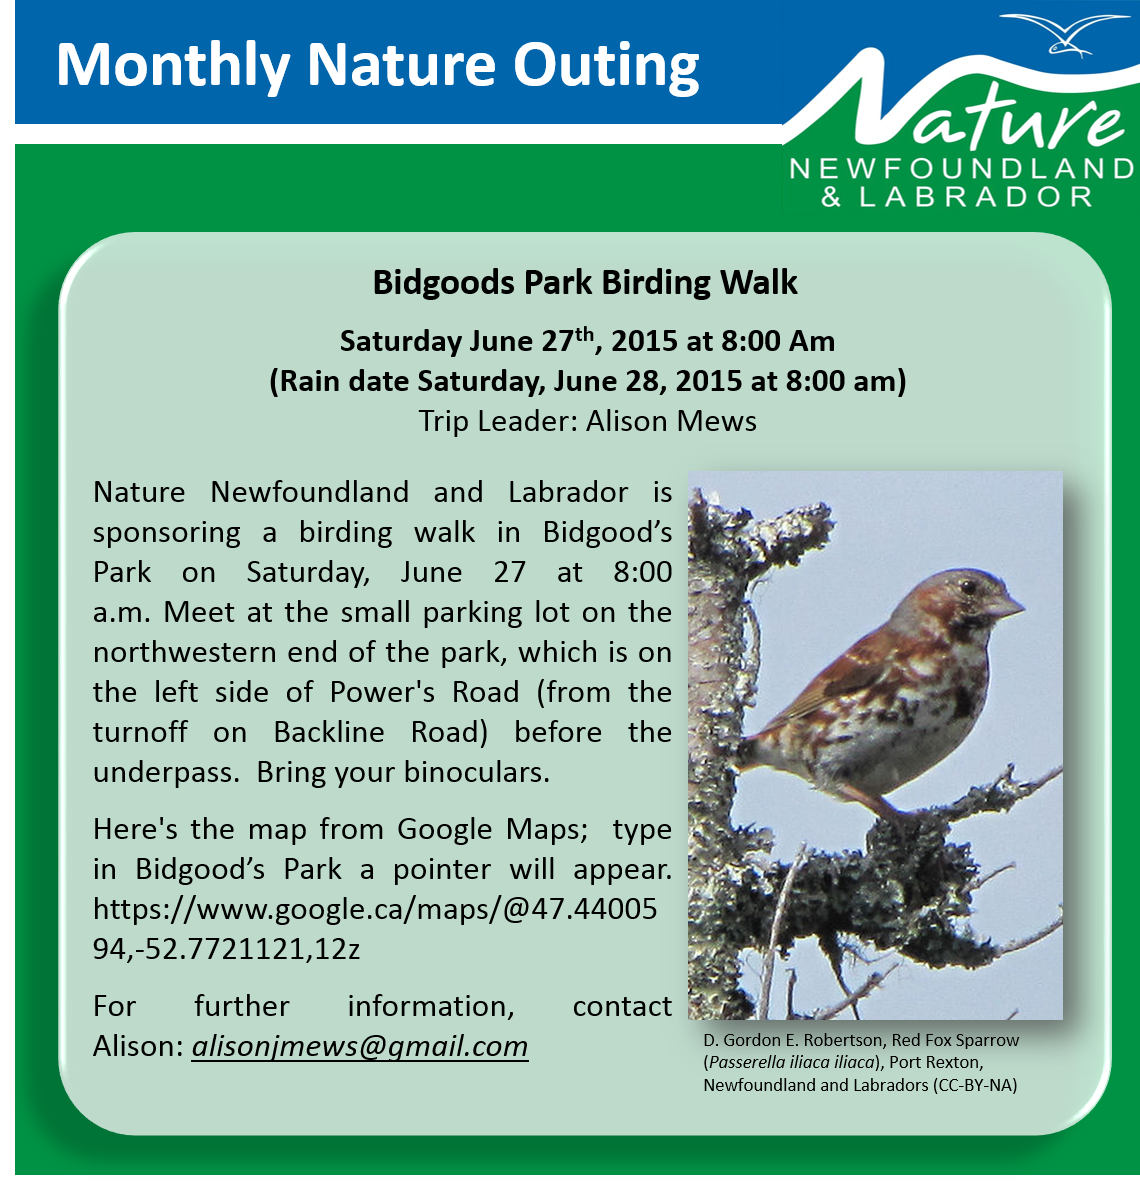 Bidgood's Park Birding Walk